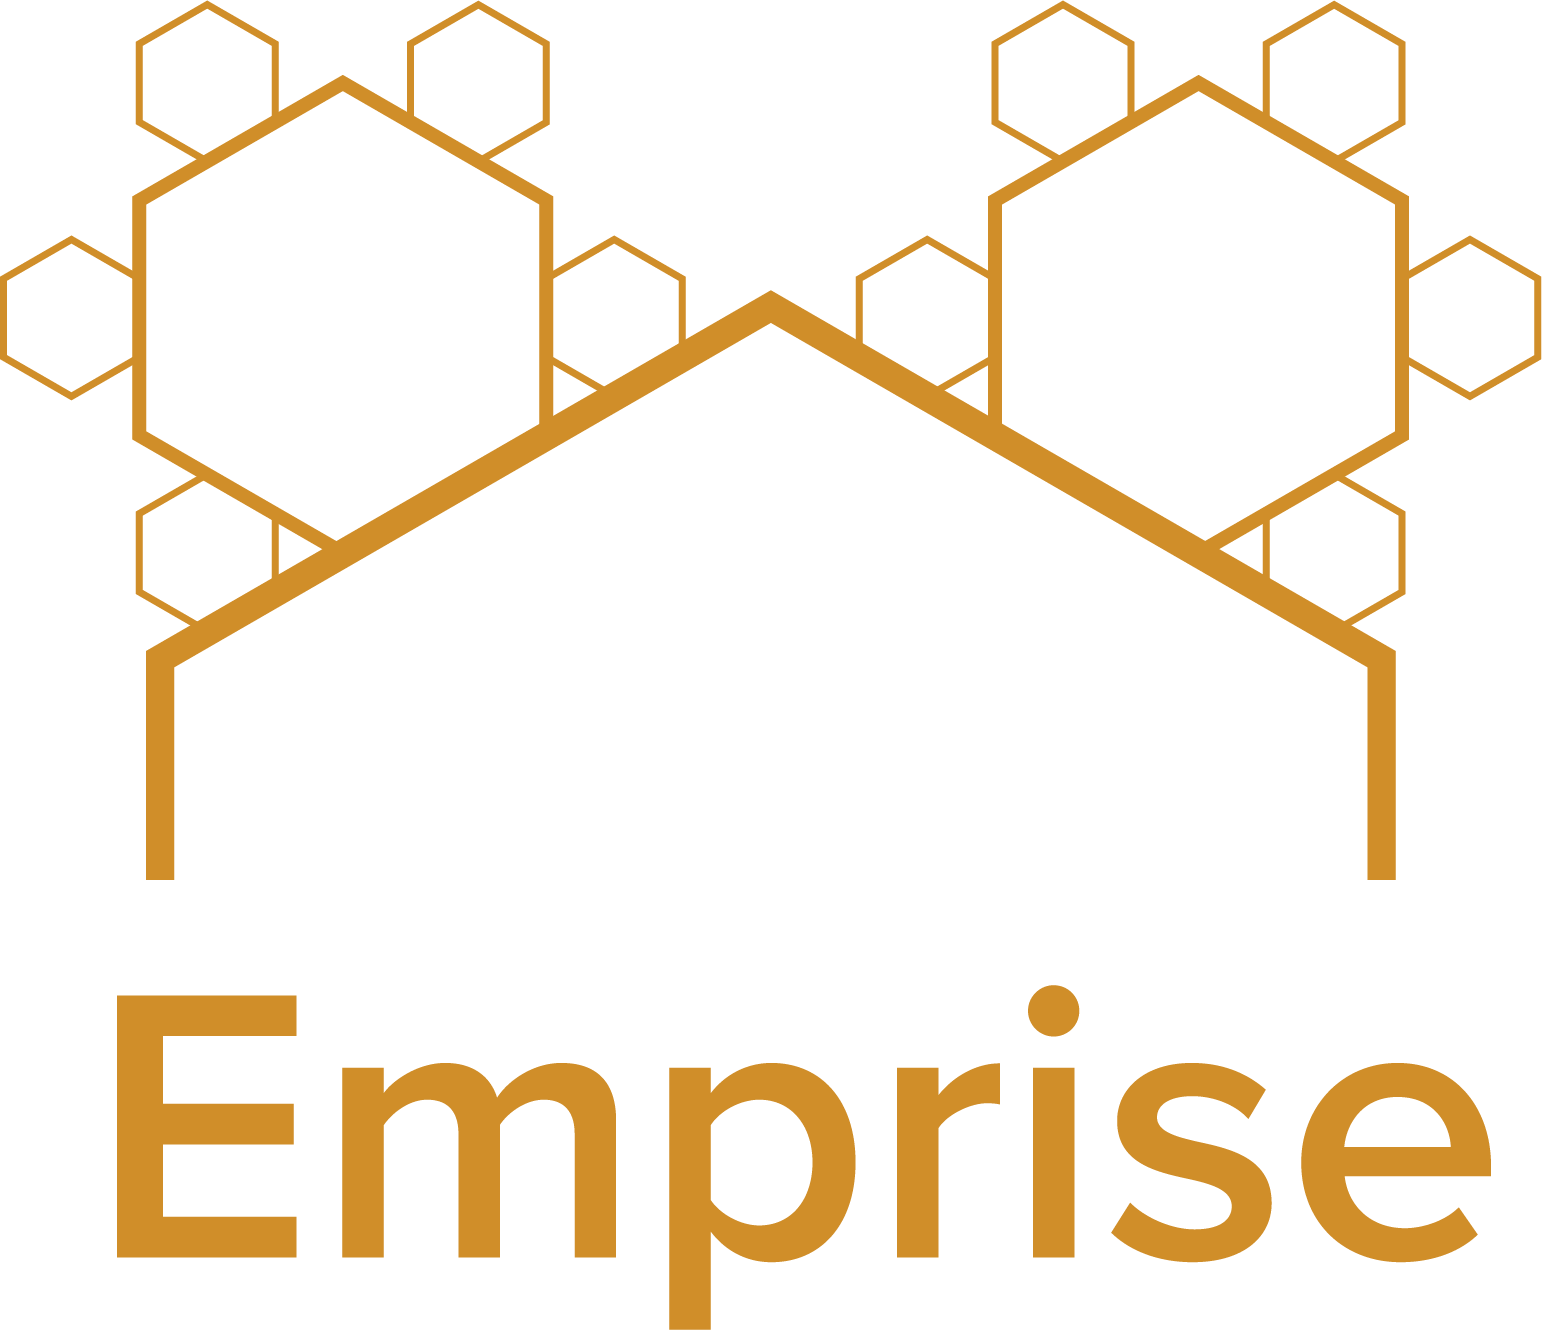 empredu_infrastructure_logo_upper.png